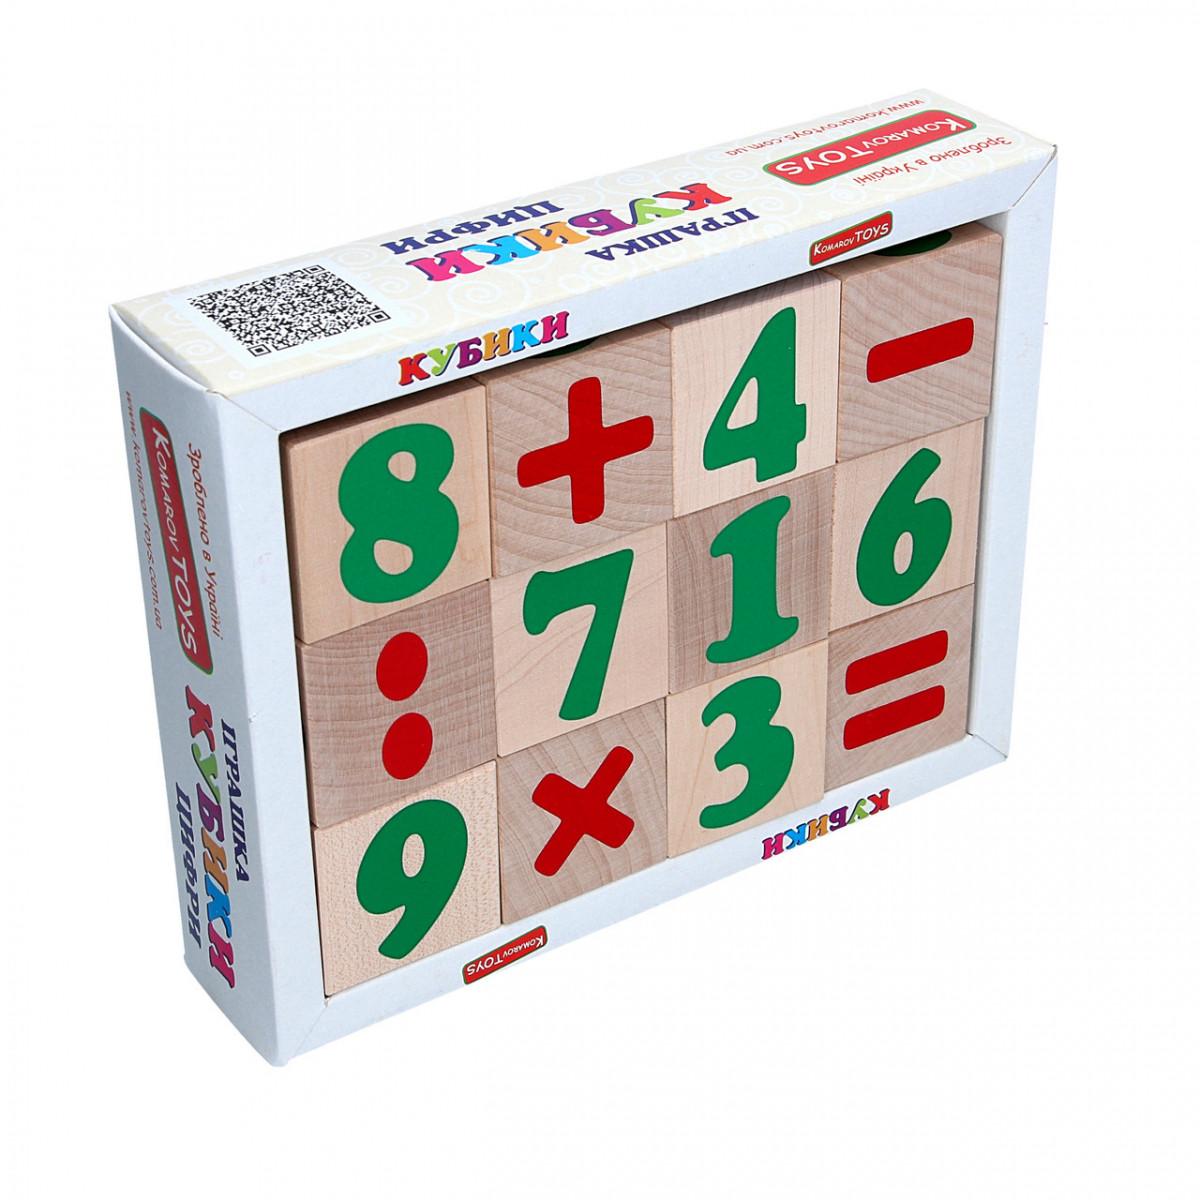 Цифры знаки Деревянные кубики, Komarovtoys (Т 604)